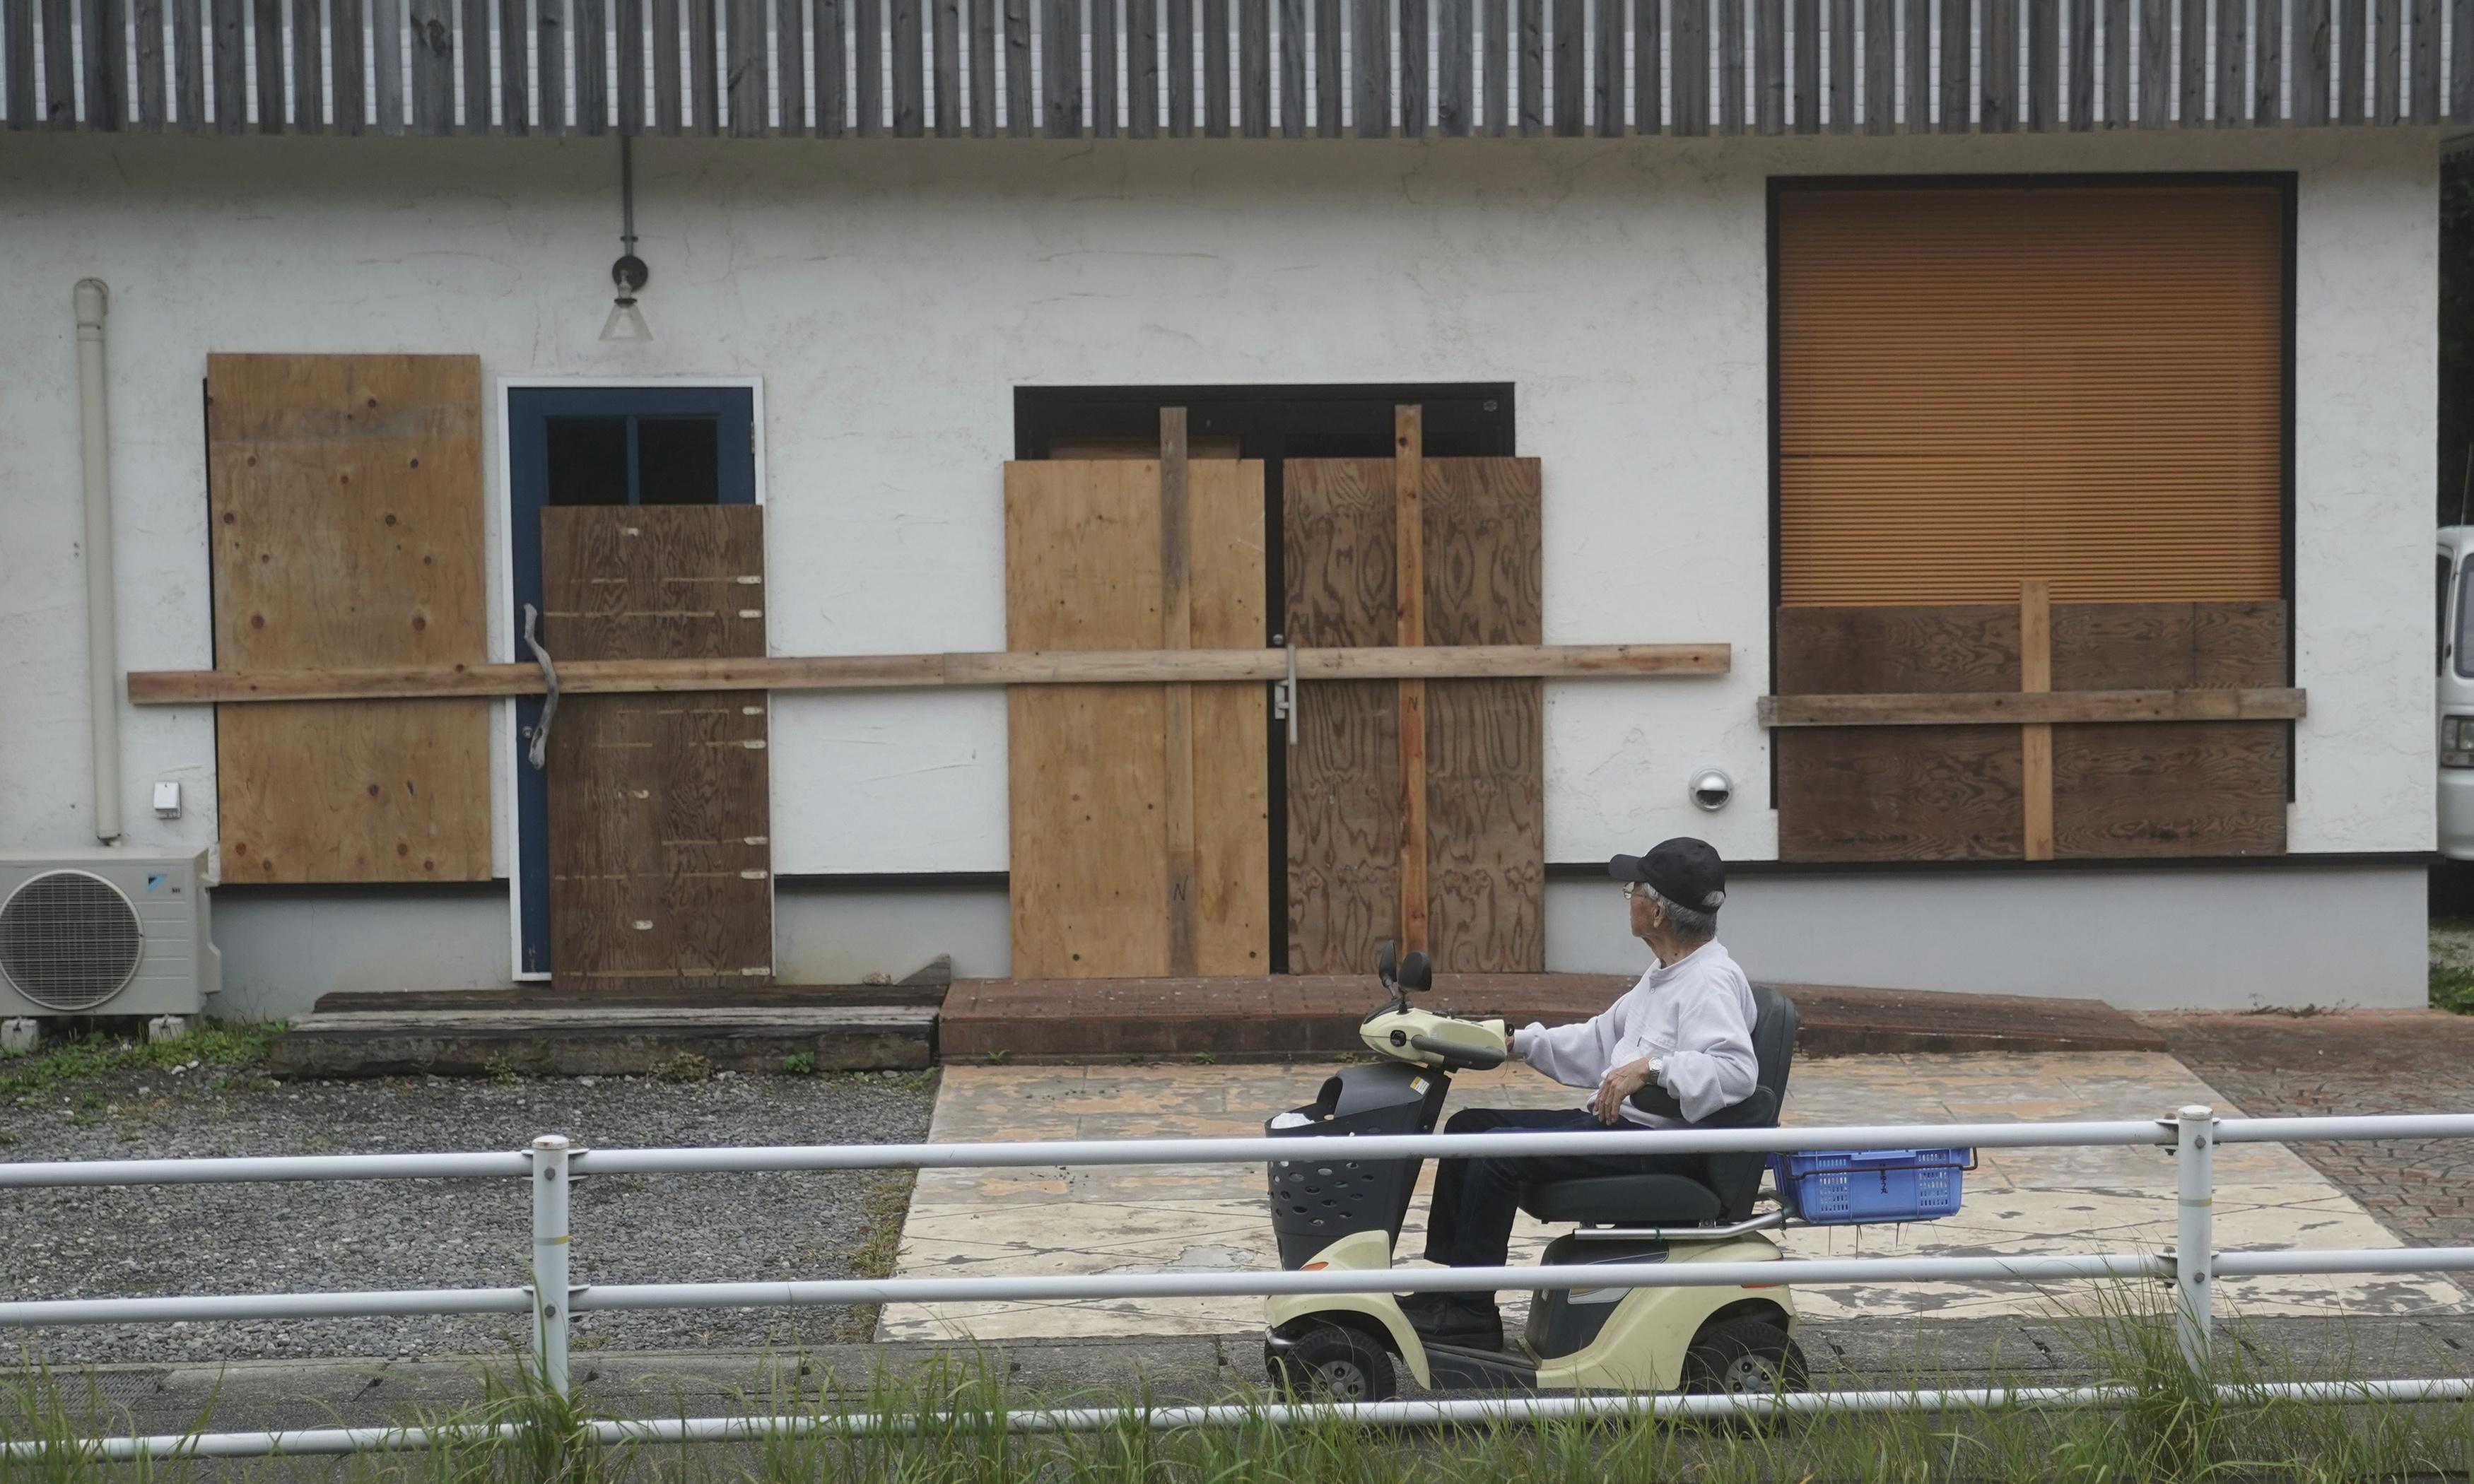 Japan orders evacuations as Typhoon Hagibis arrives